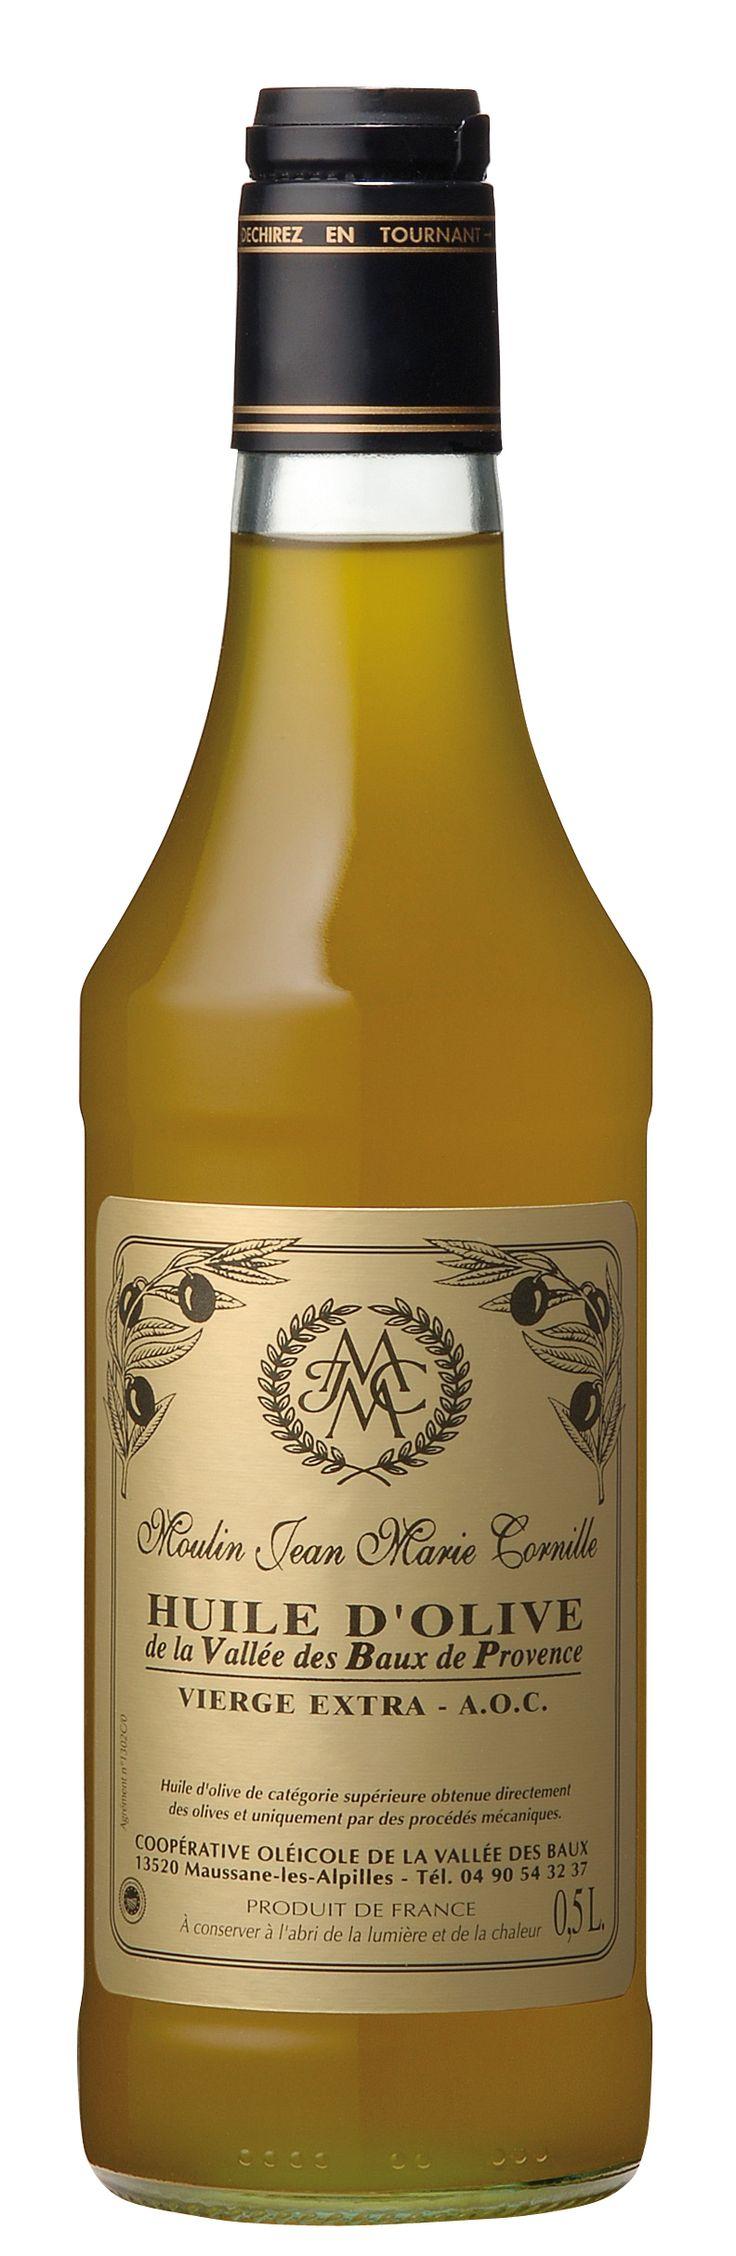 Moulin Jean-Marie Cornille olive oil